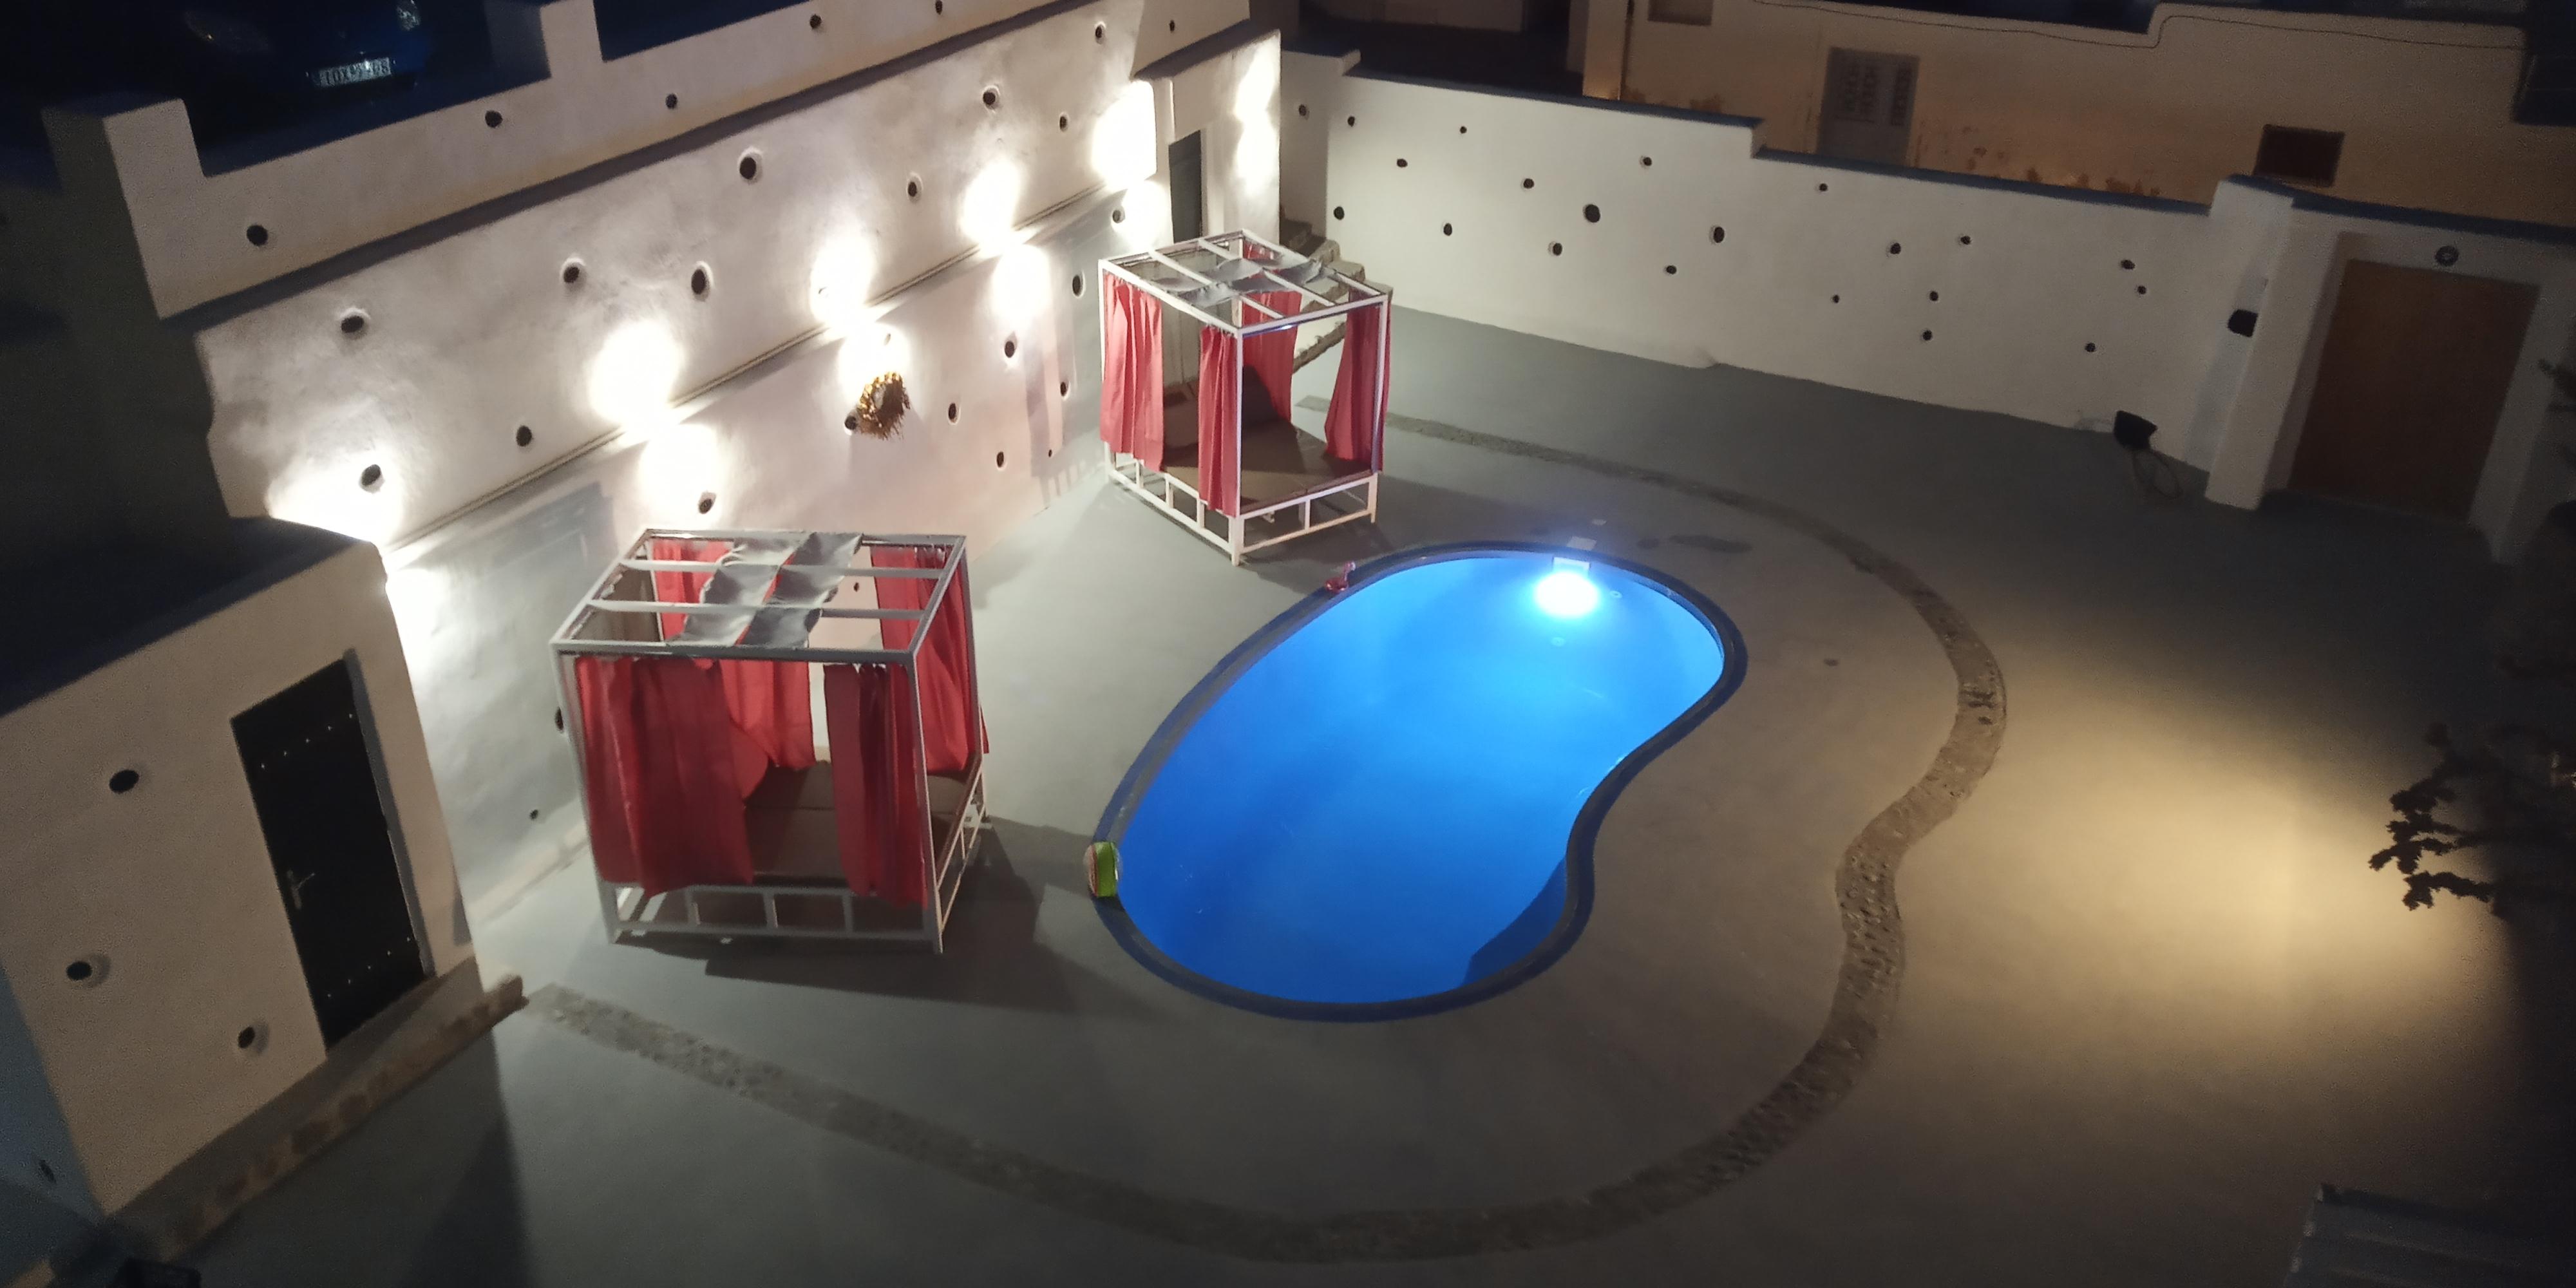 Santorini Charming Haven-Pool & Sauna Retreat